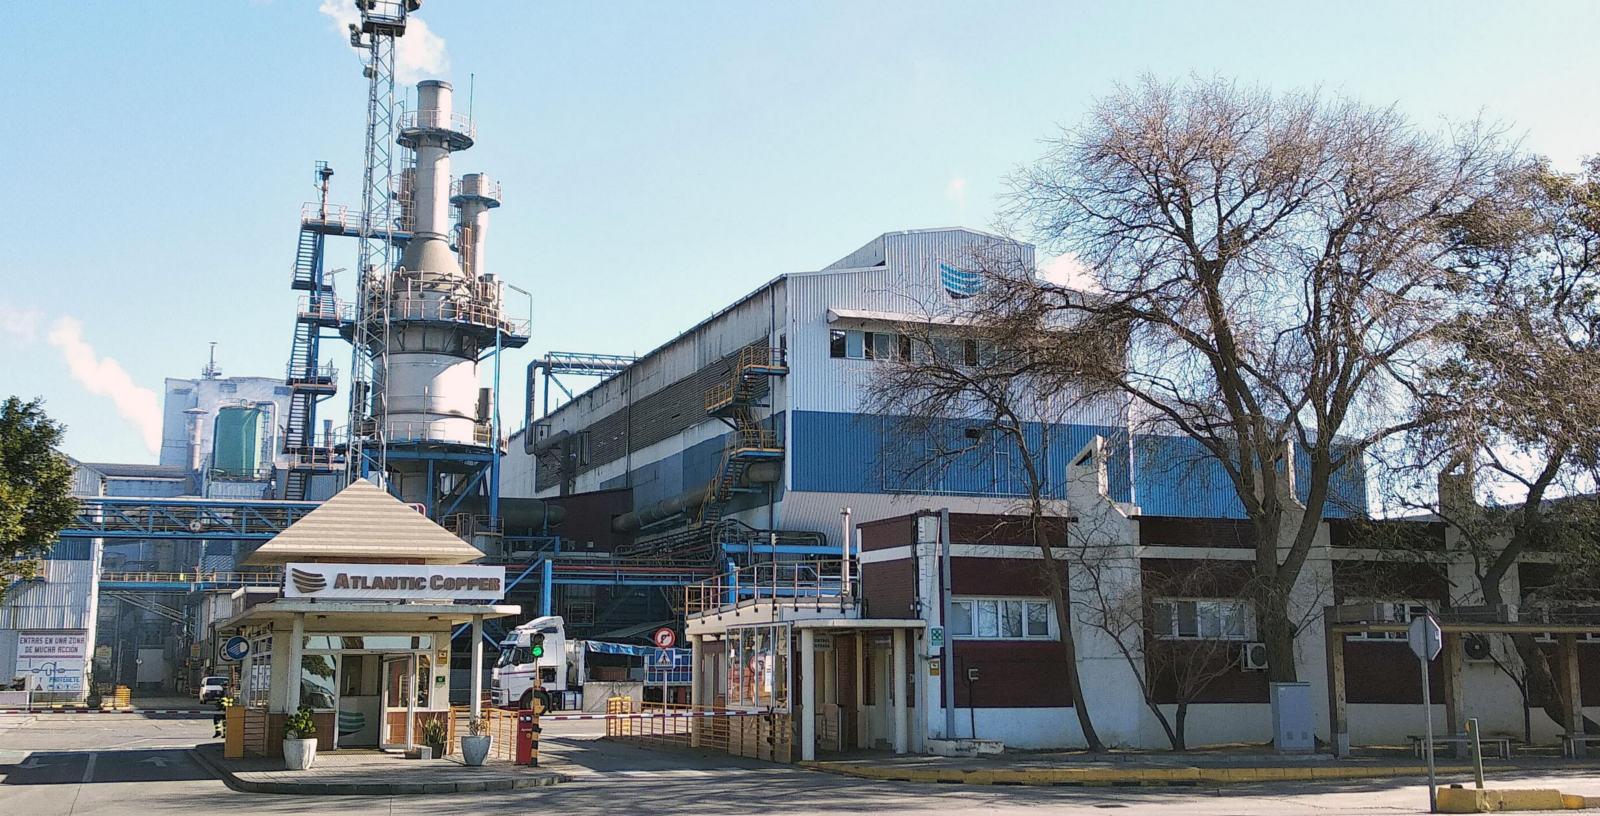 Nickel_Carbonate-plant_Atlantic-Copper_Huelva_IDOM_01